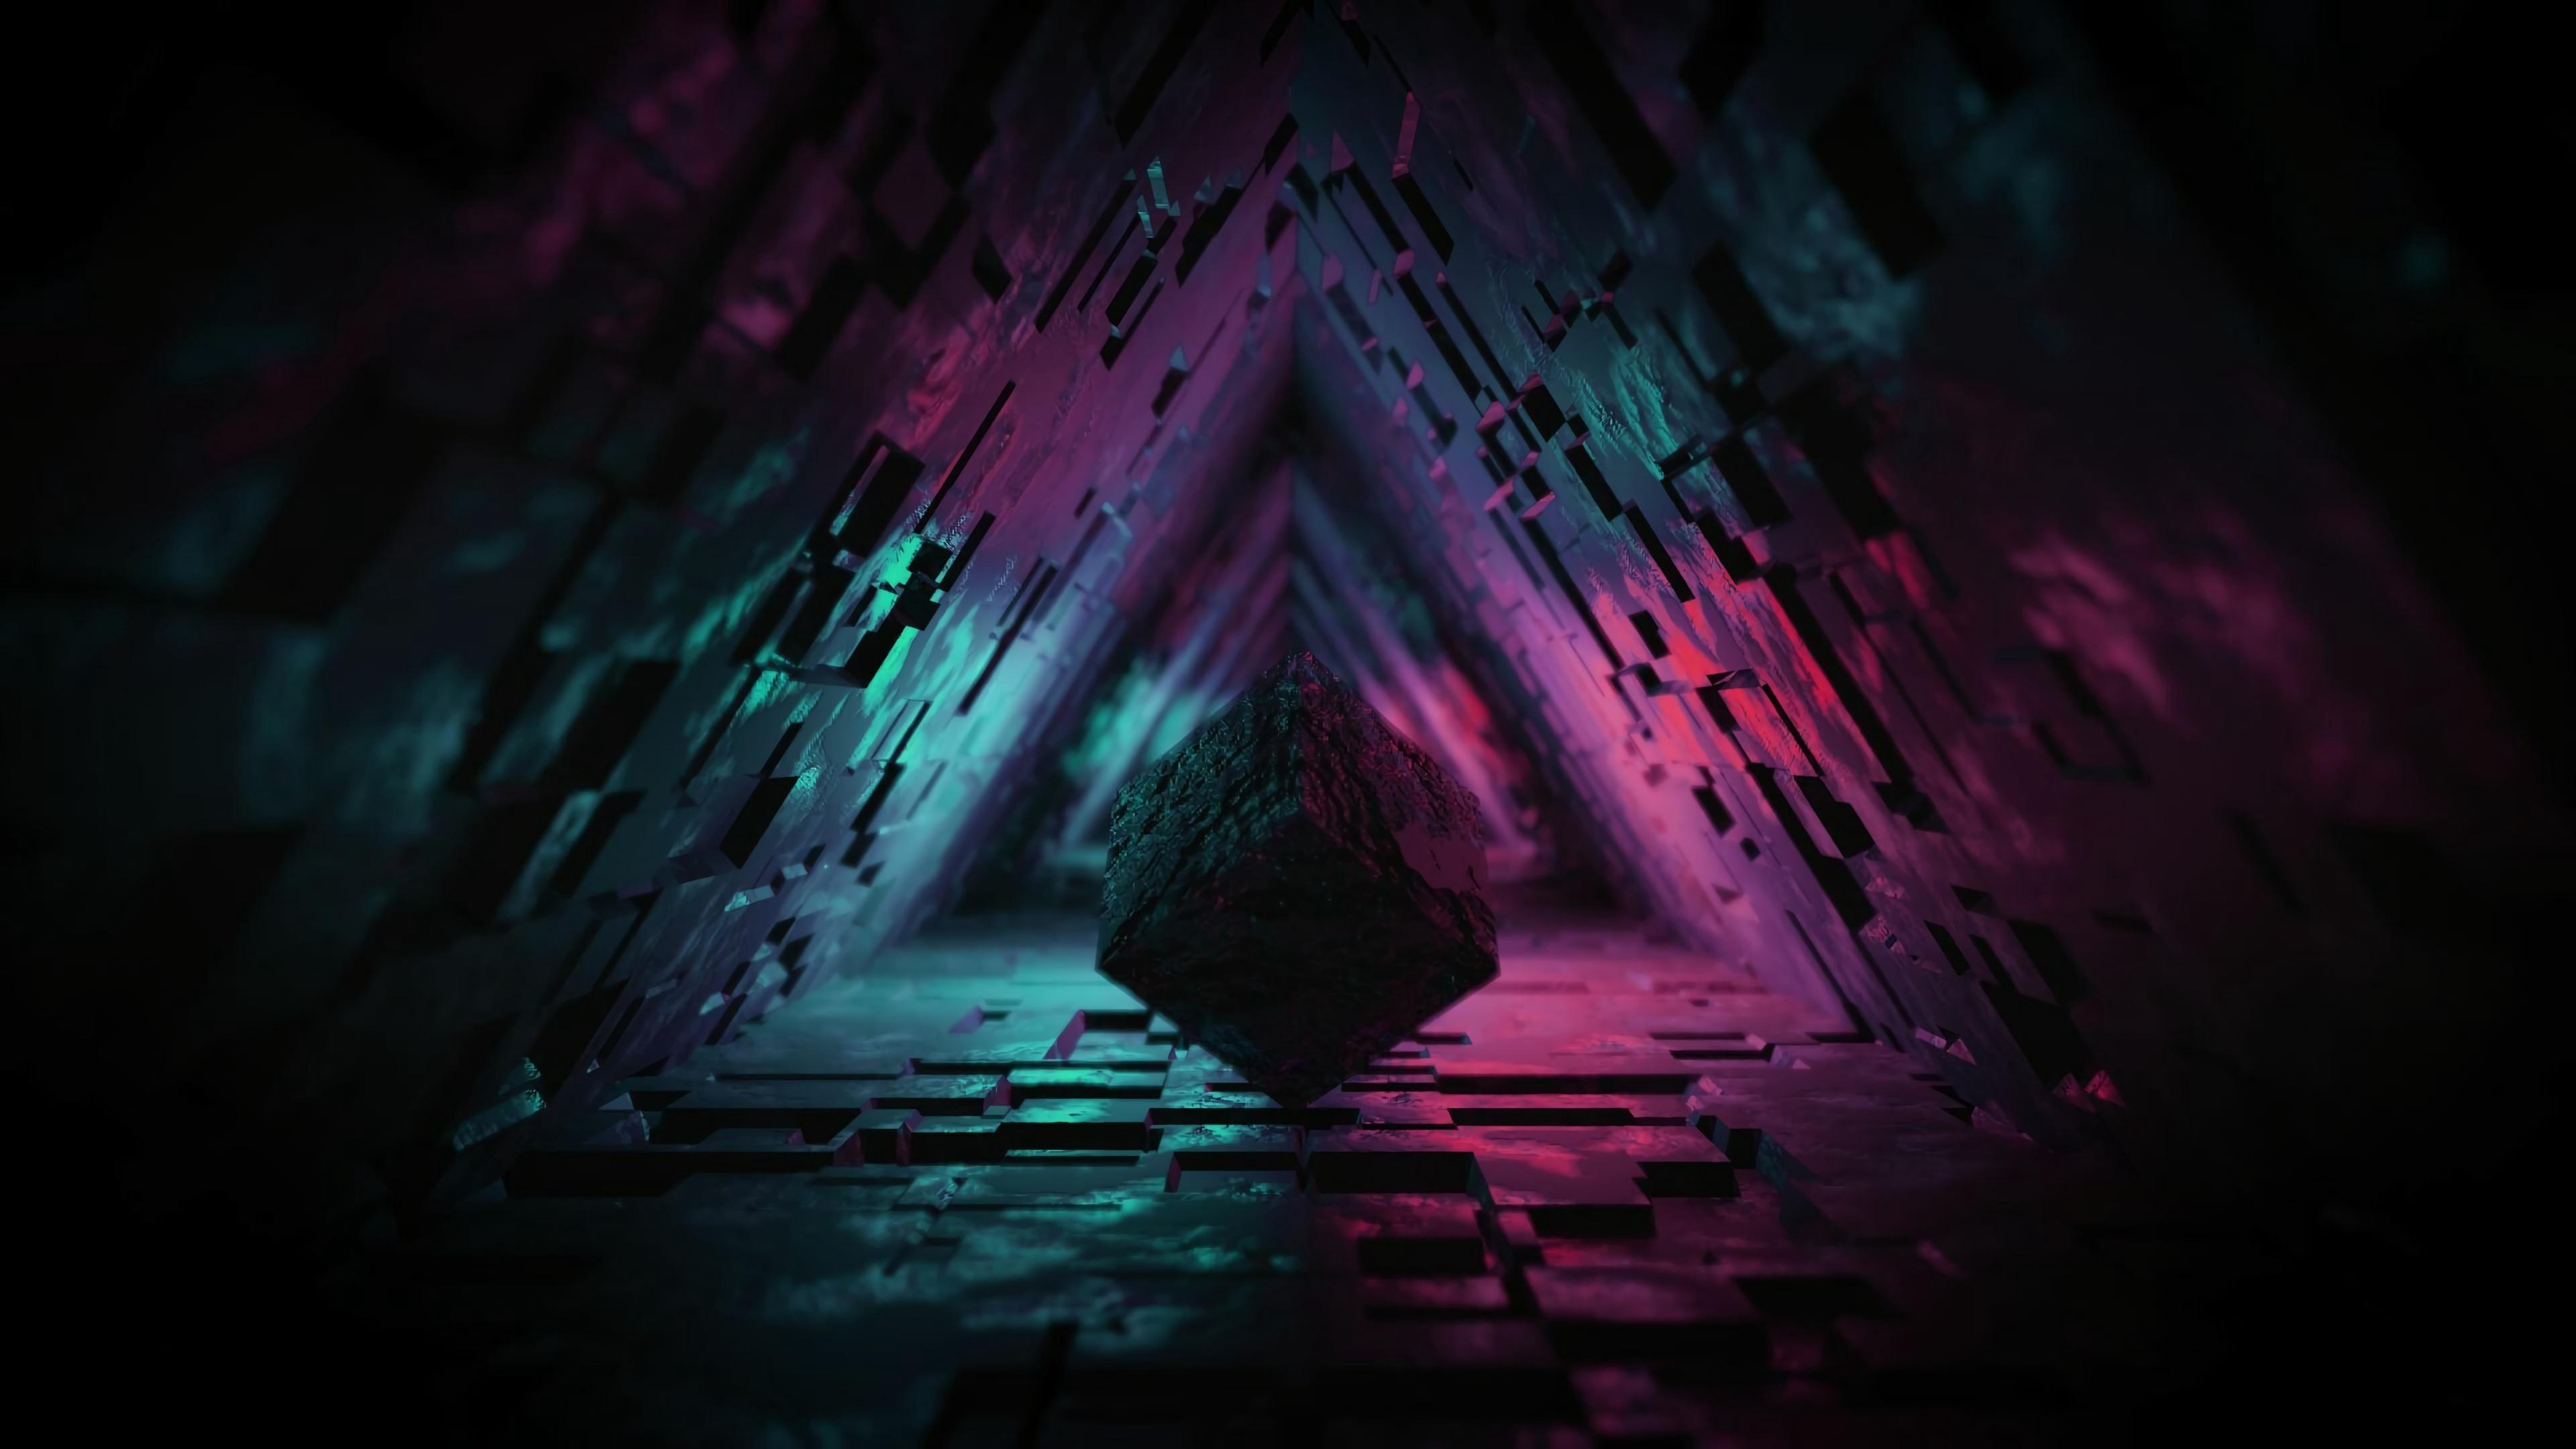 digital cave 3d triangle 1563221536 - Digital Cave 3d Triangle - triangle wallpapers, hd-wallpapers, digital art wallpapers, artstation wallpapers, abstract wallpapers, 4k-wallpapers, 3d wallpapers